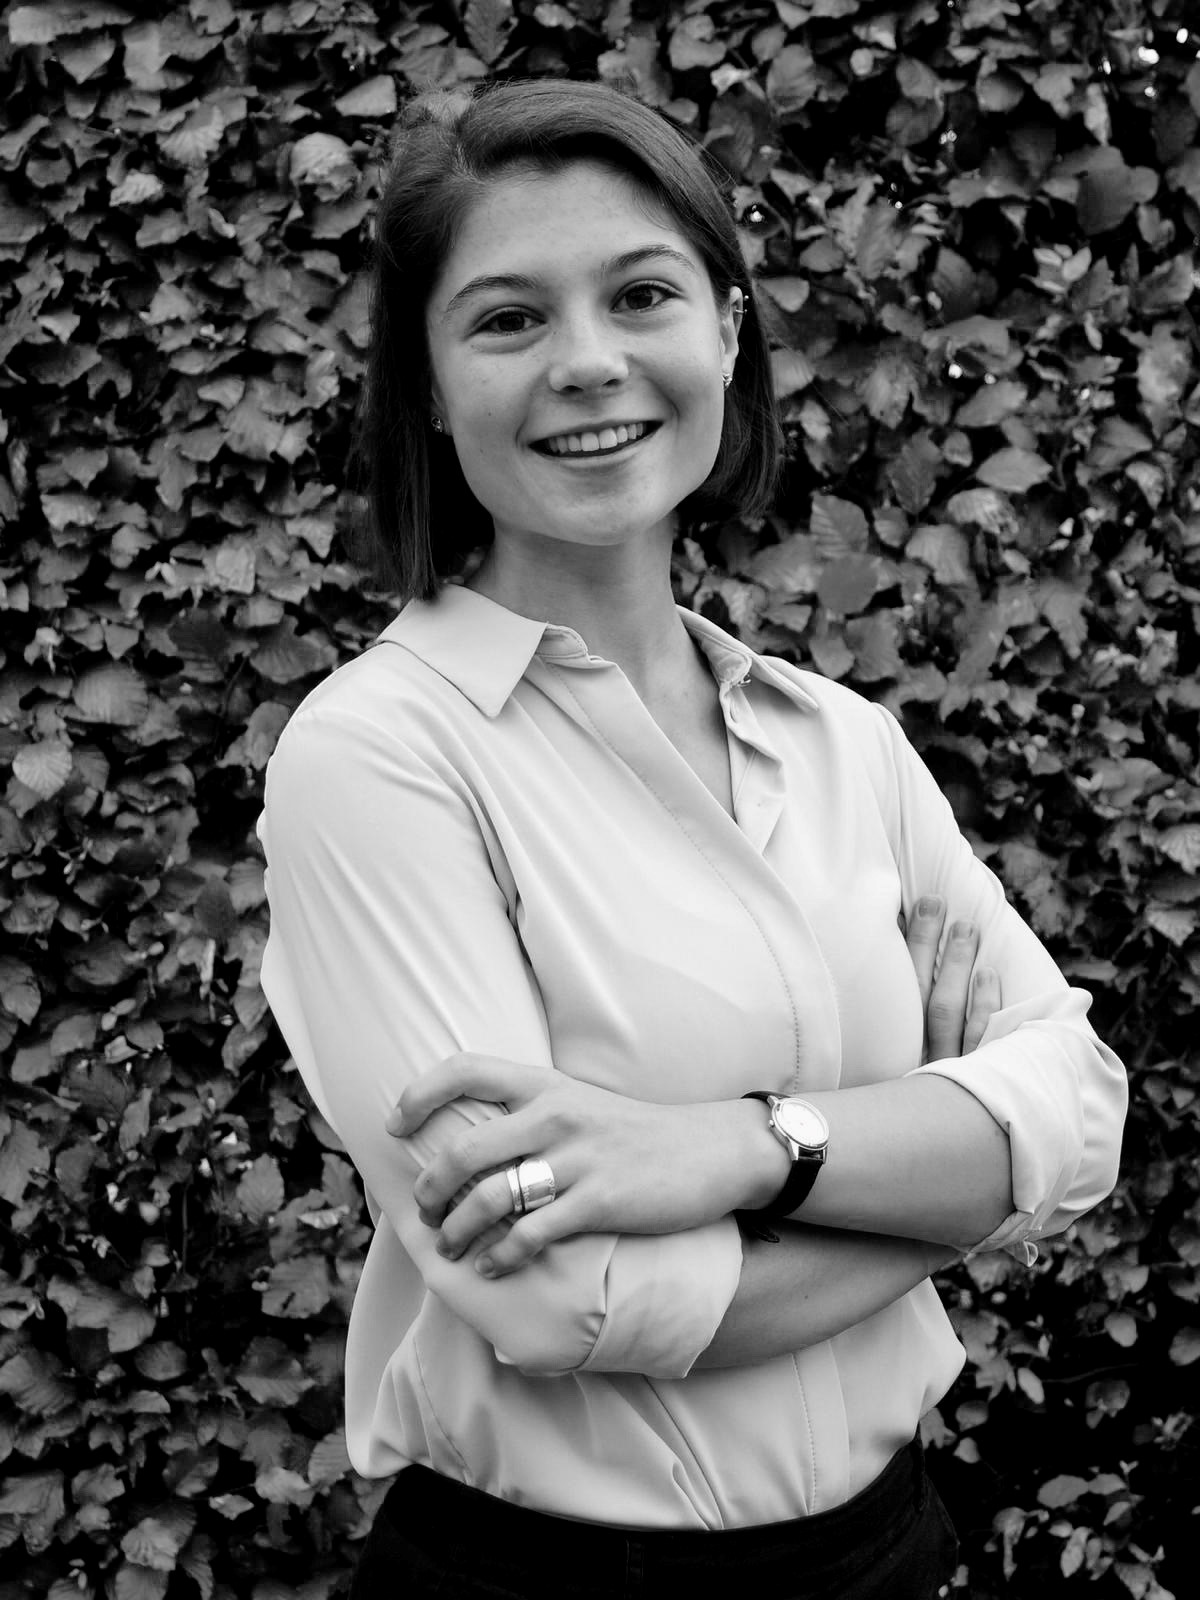 Evelyn Stele (Austria)